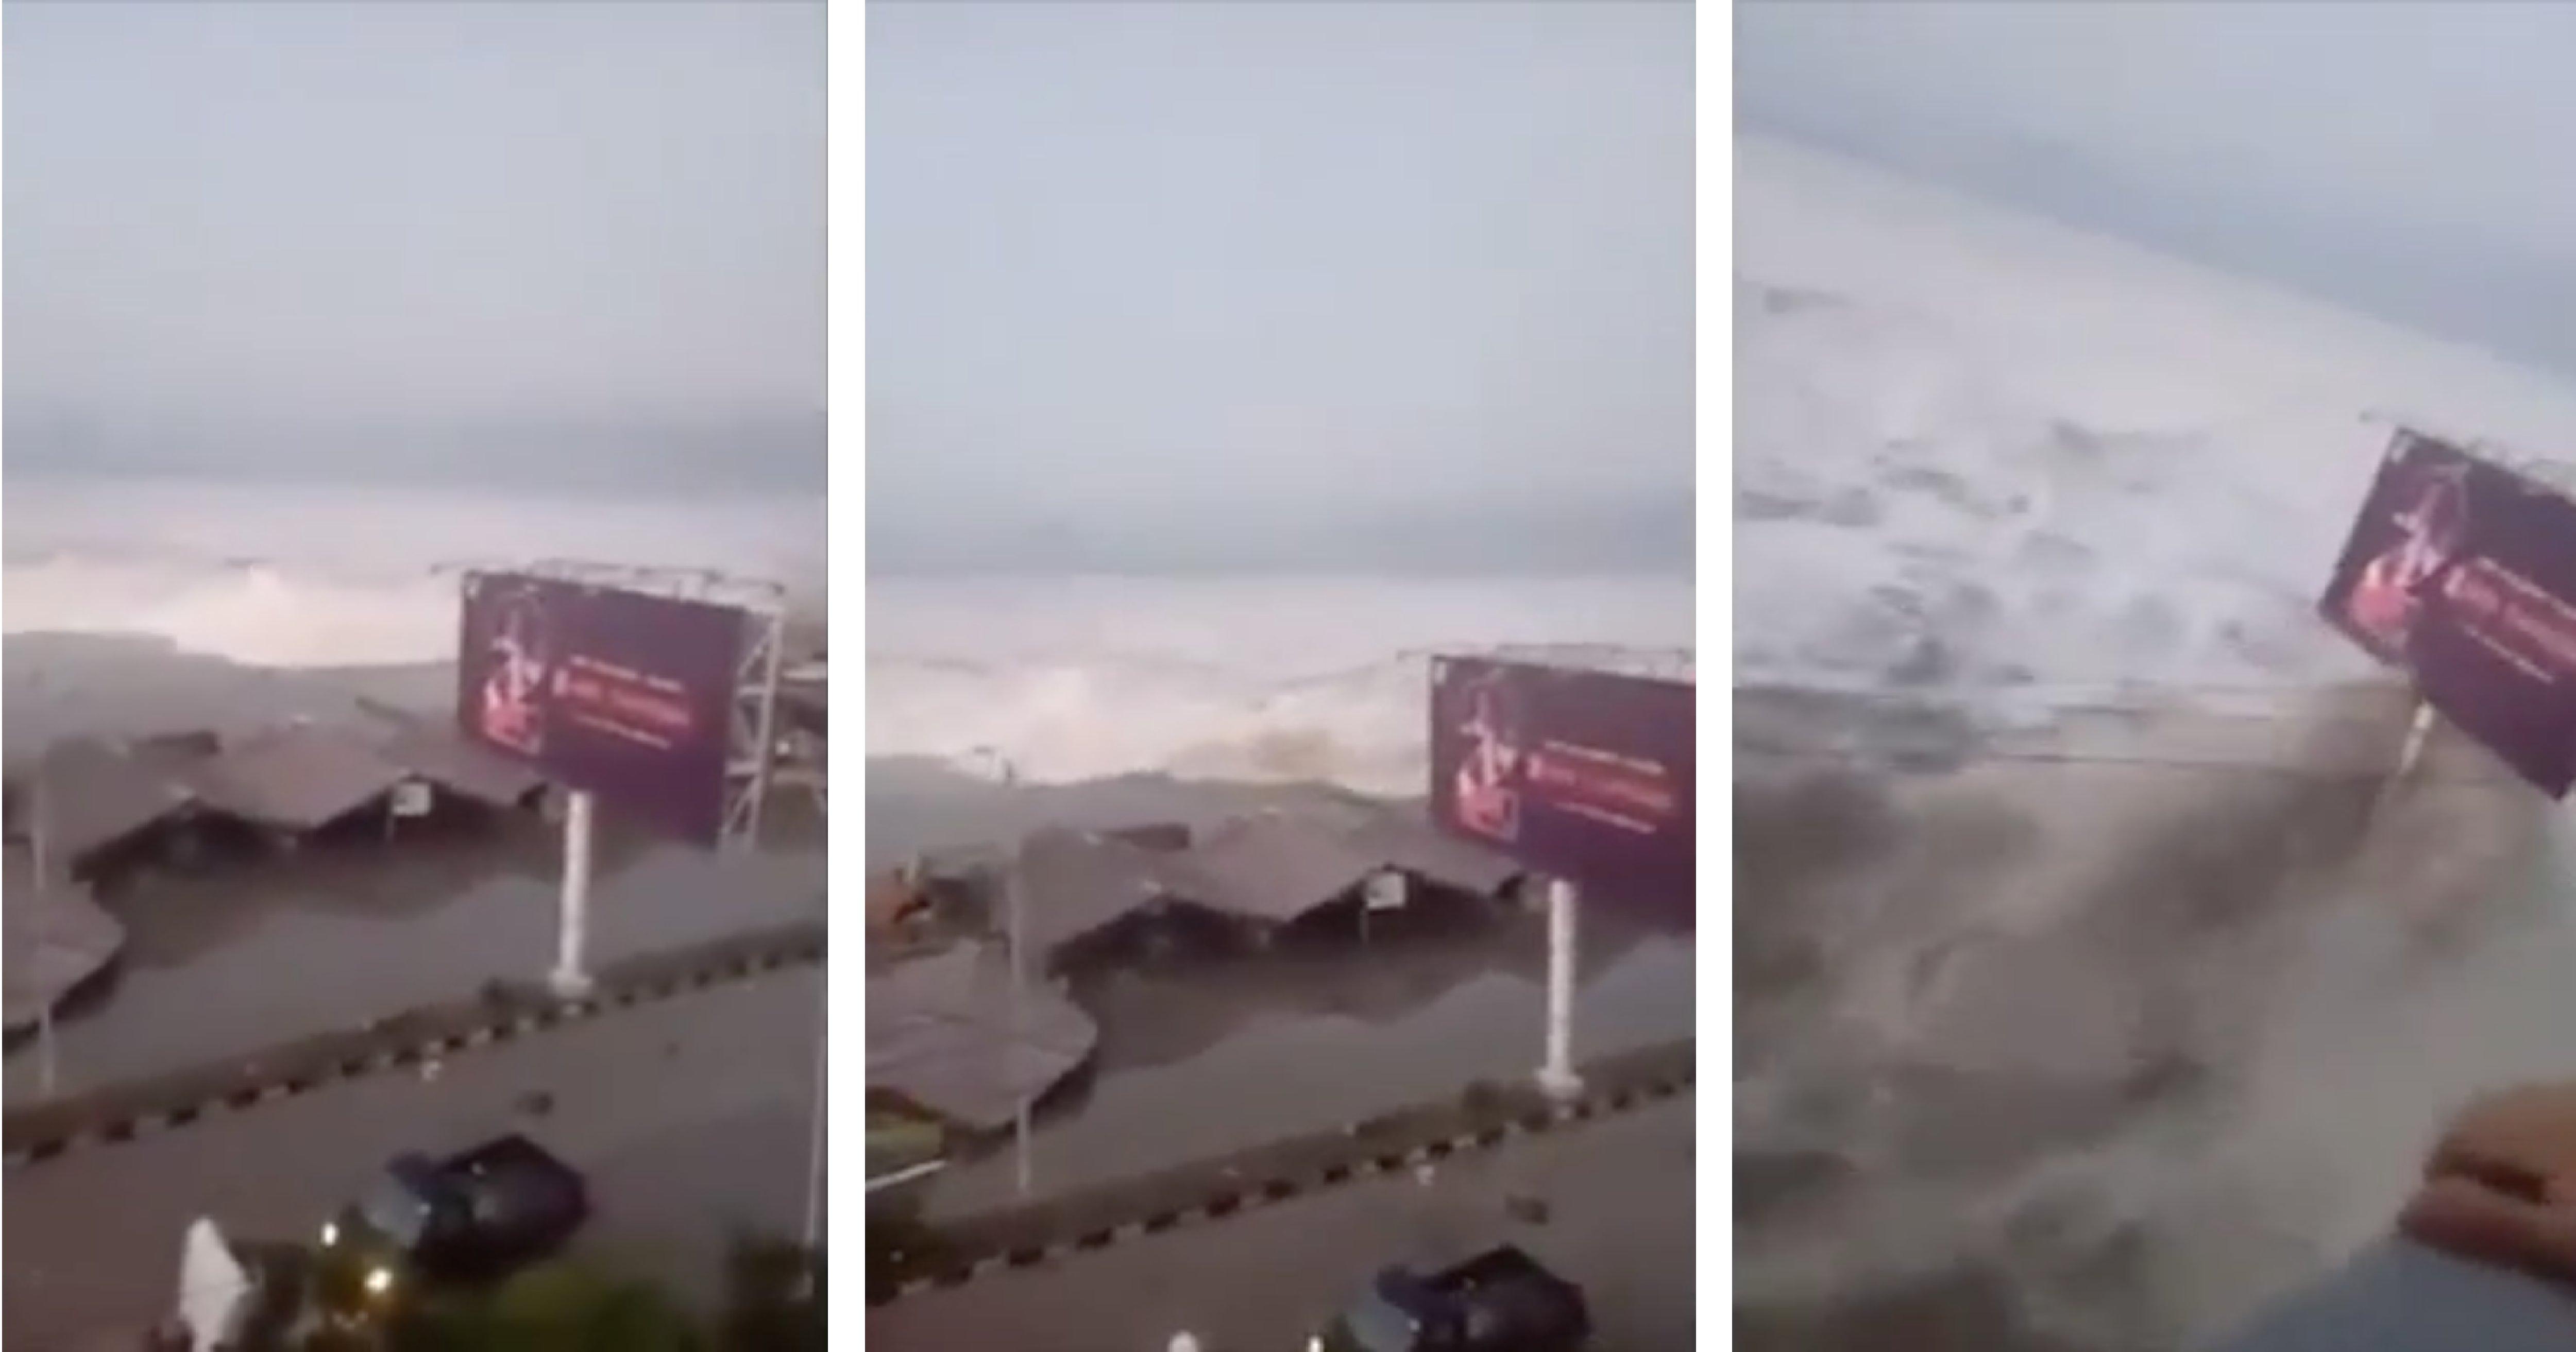 e5b081e99da2 1 1.png?resize=1200,630 - 印尼海嘯宛如煉獄!「超驚悚大浪」讓網友憶起當年20萬死的南亞大海嘯...